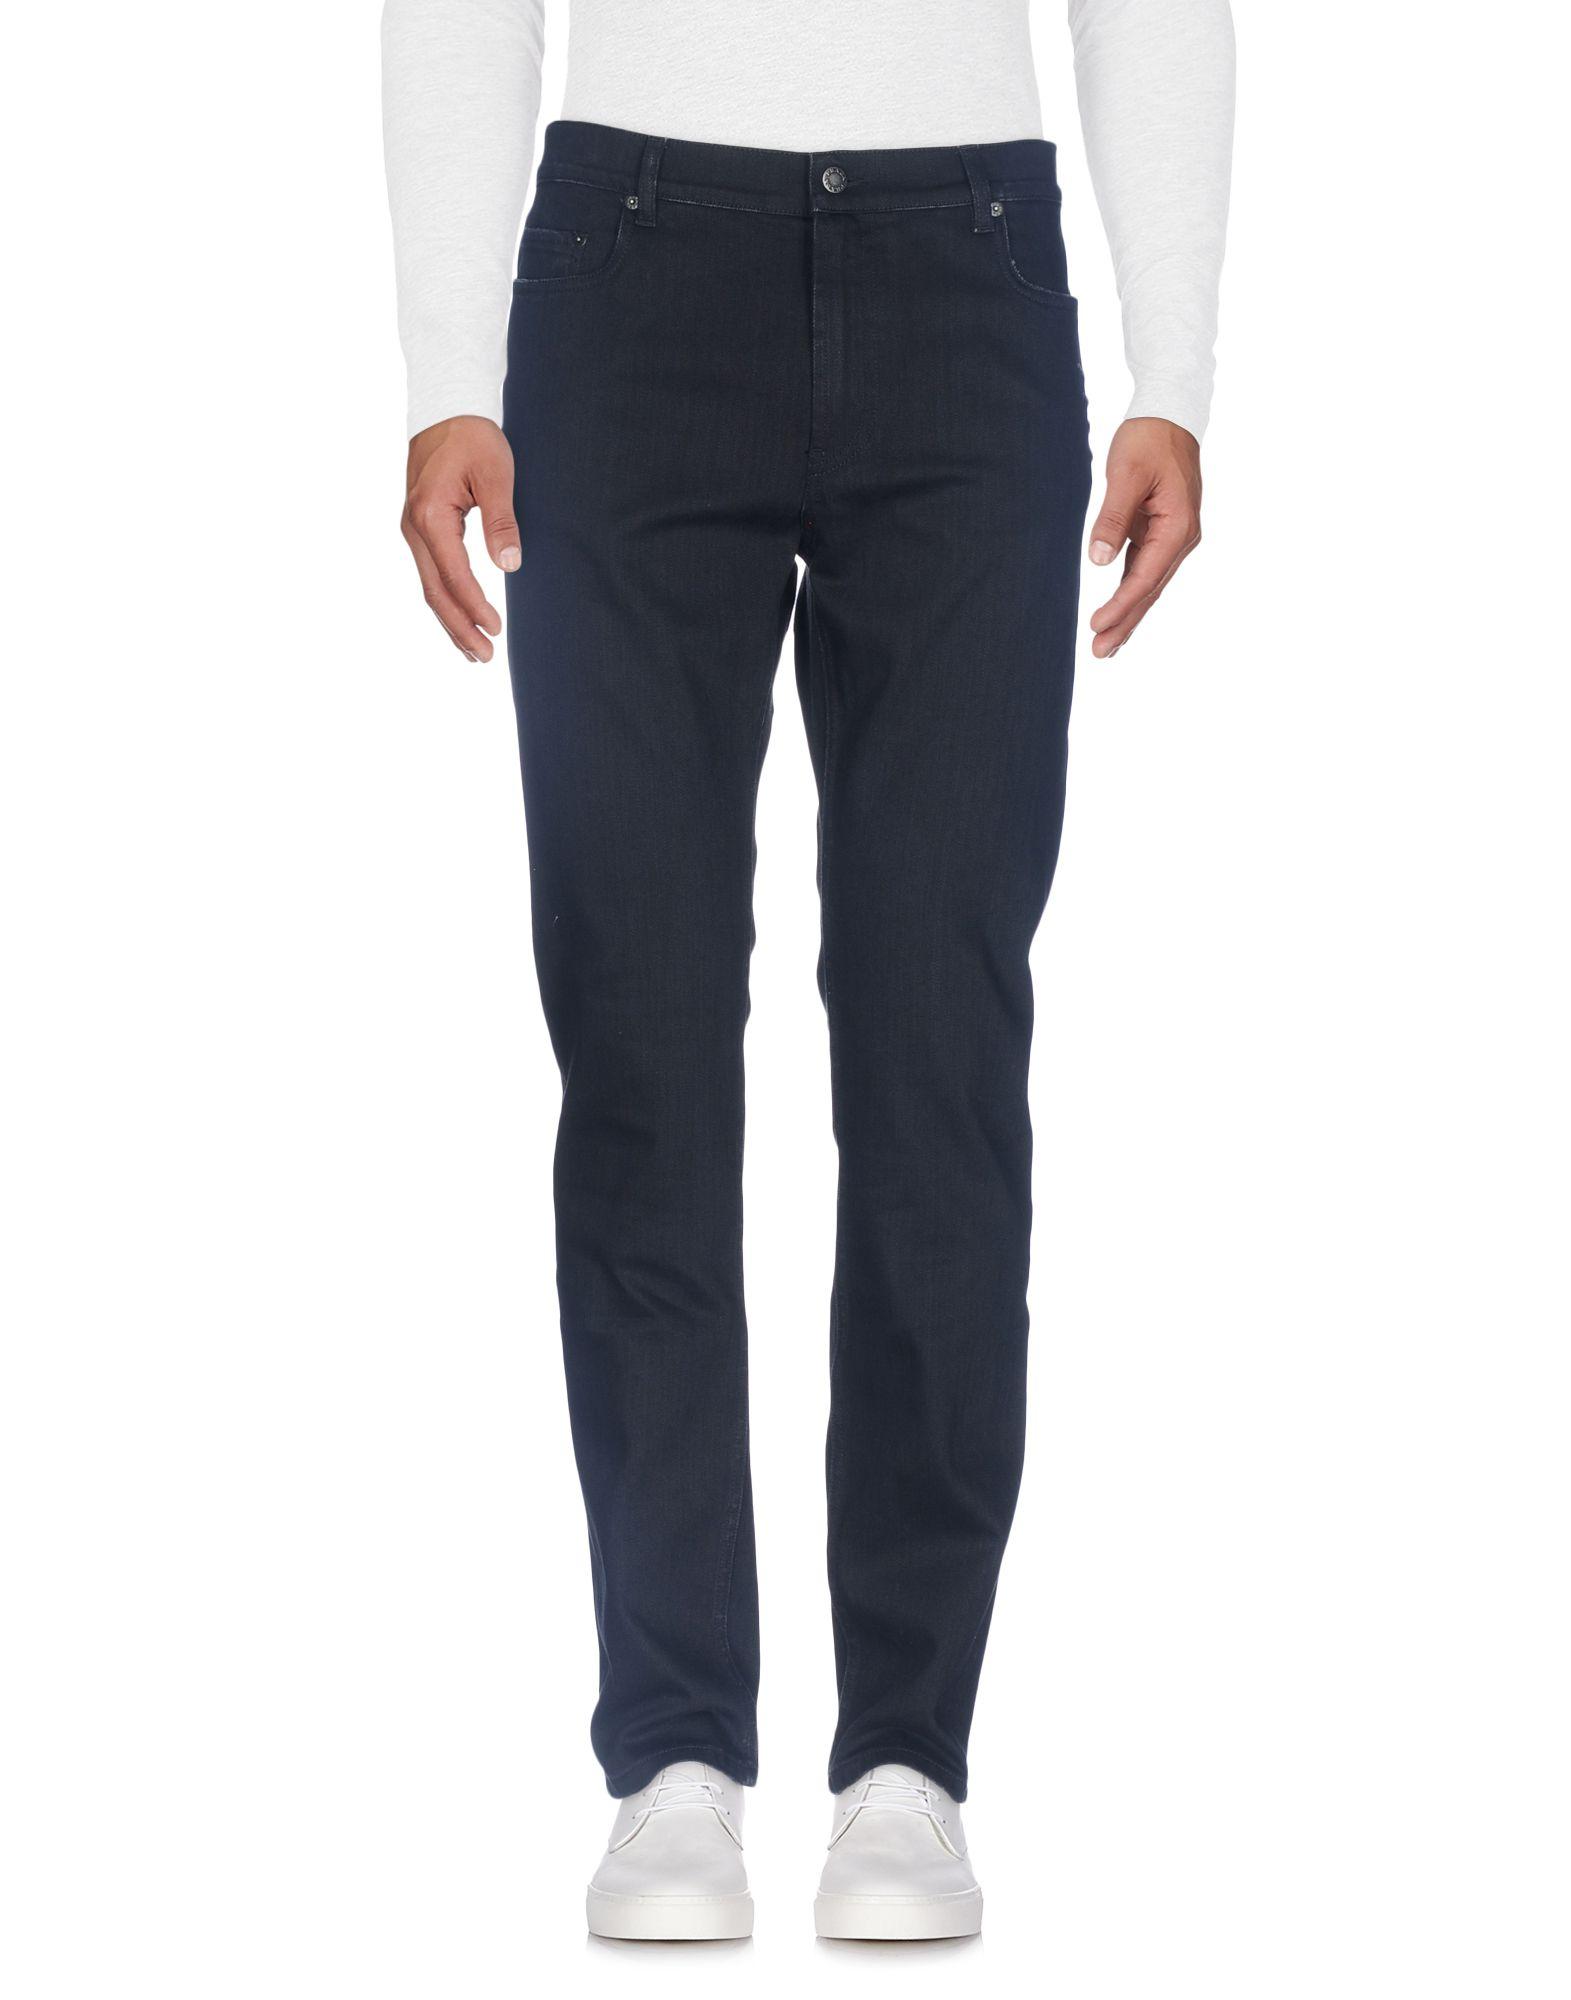 Pantaloni Jeans Prada Uomo - Acquista online su